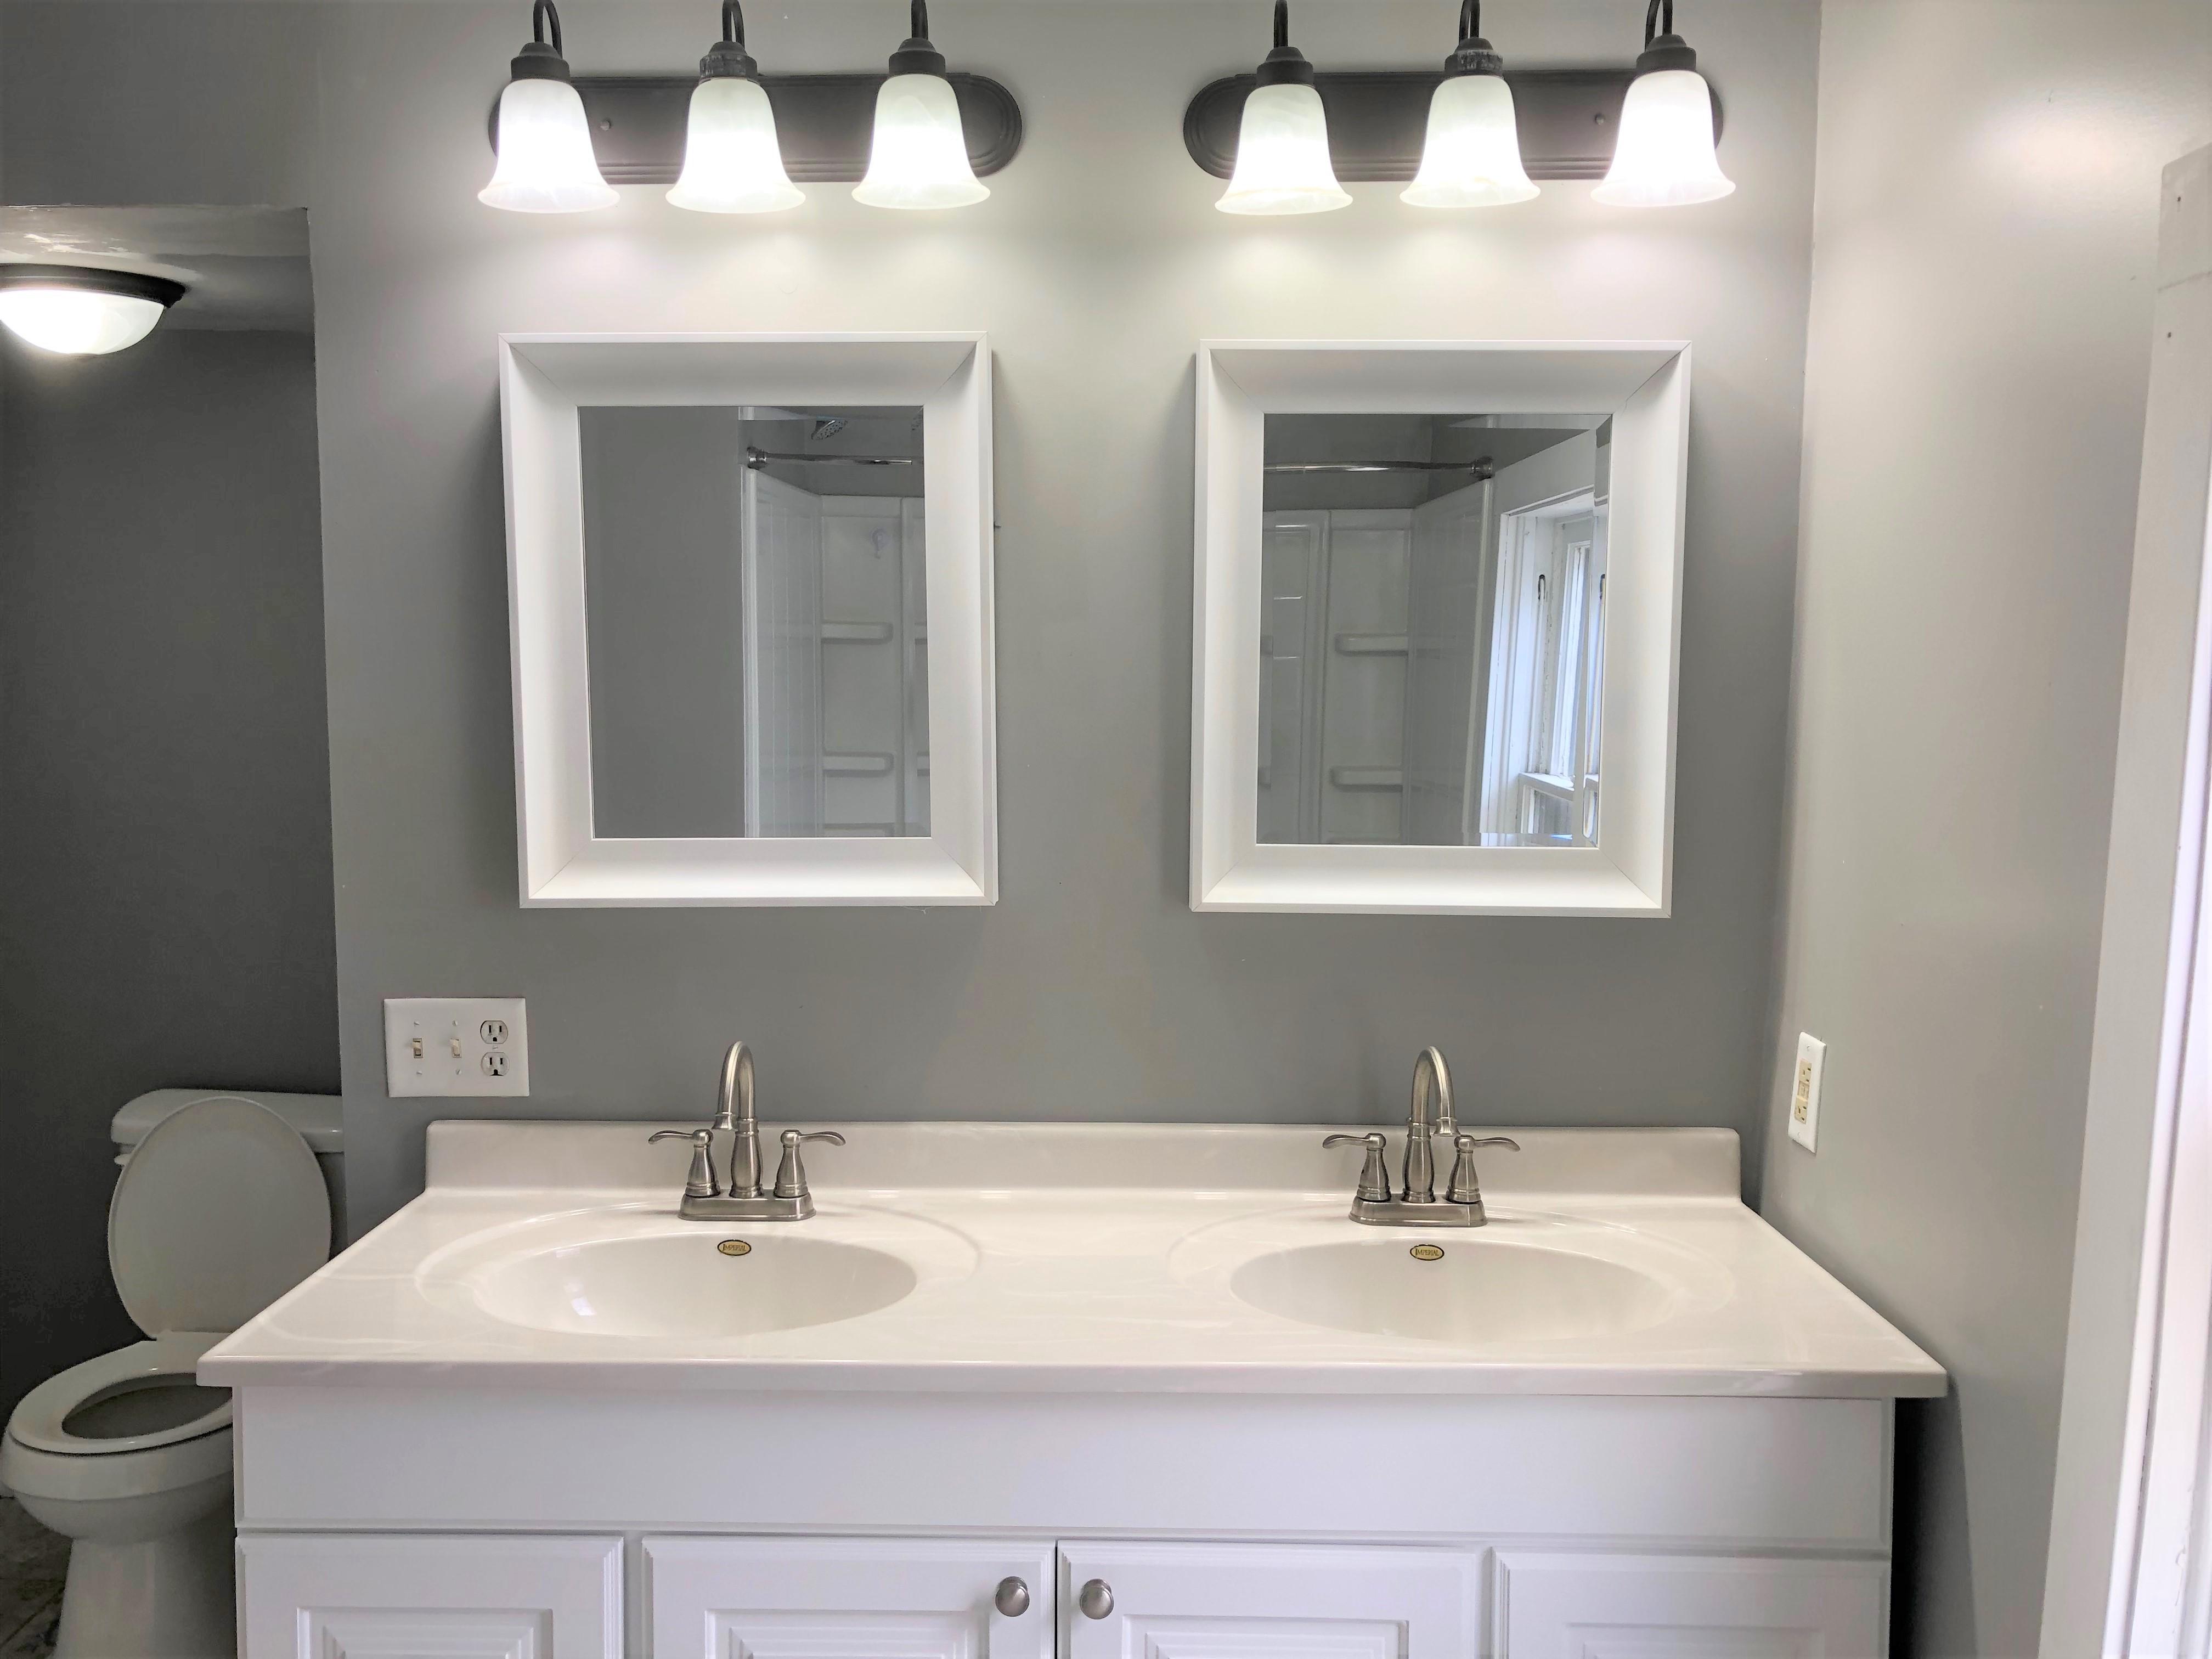 Leland Bathroom Light